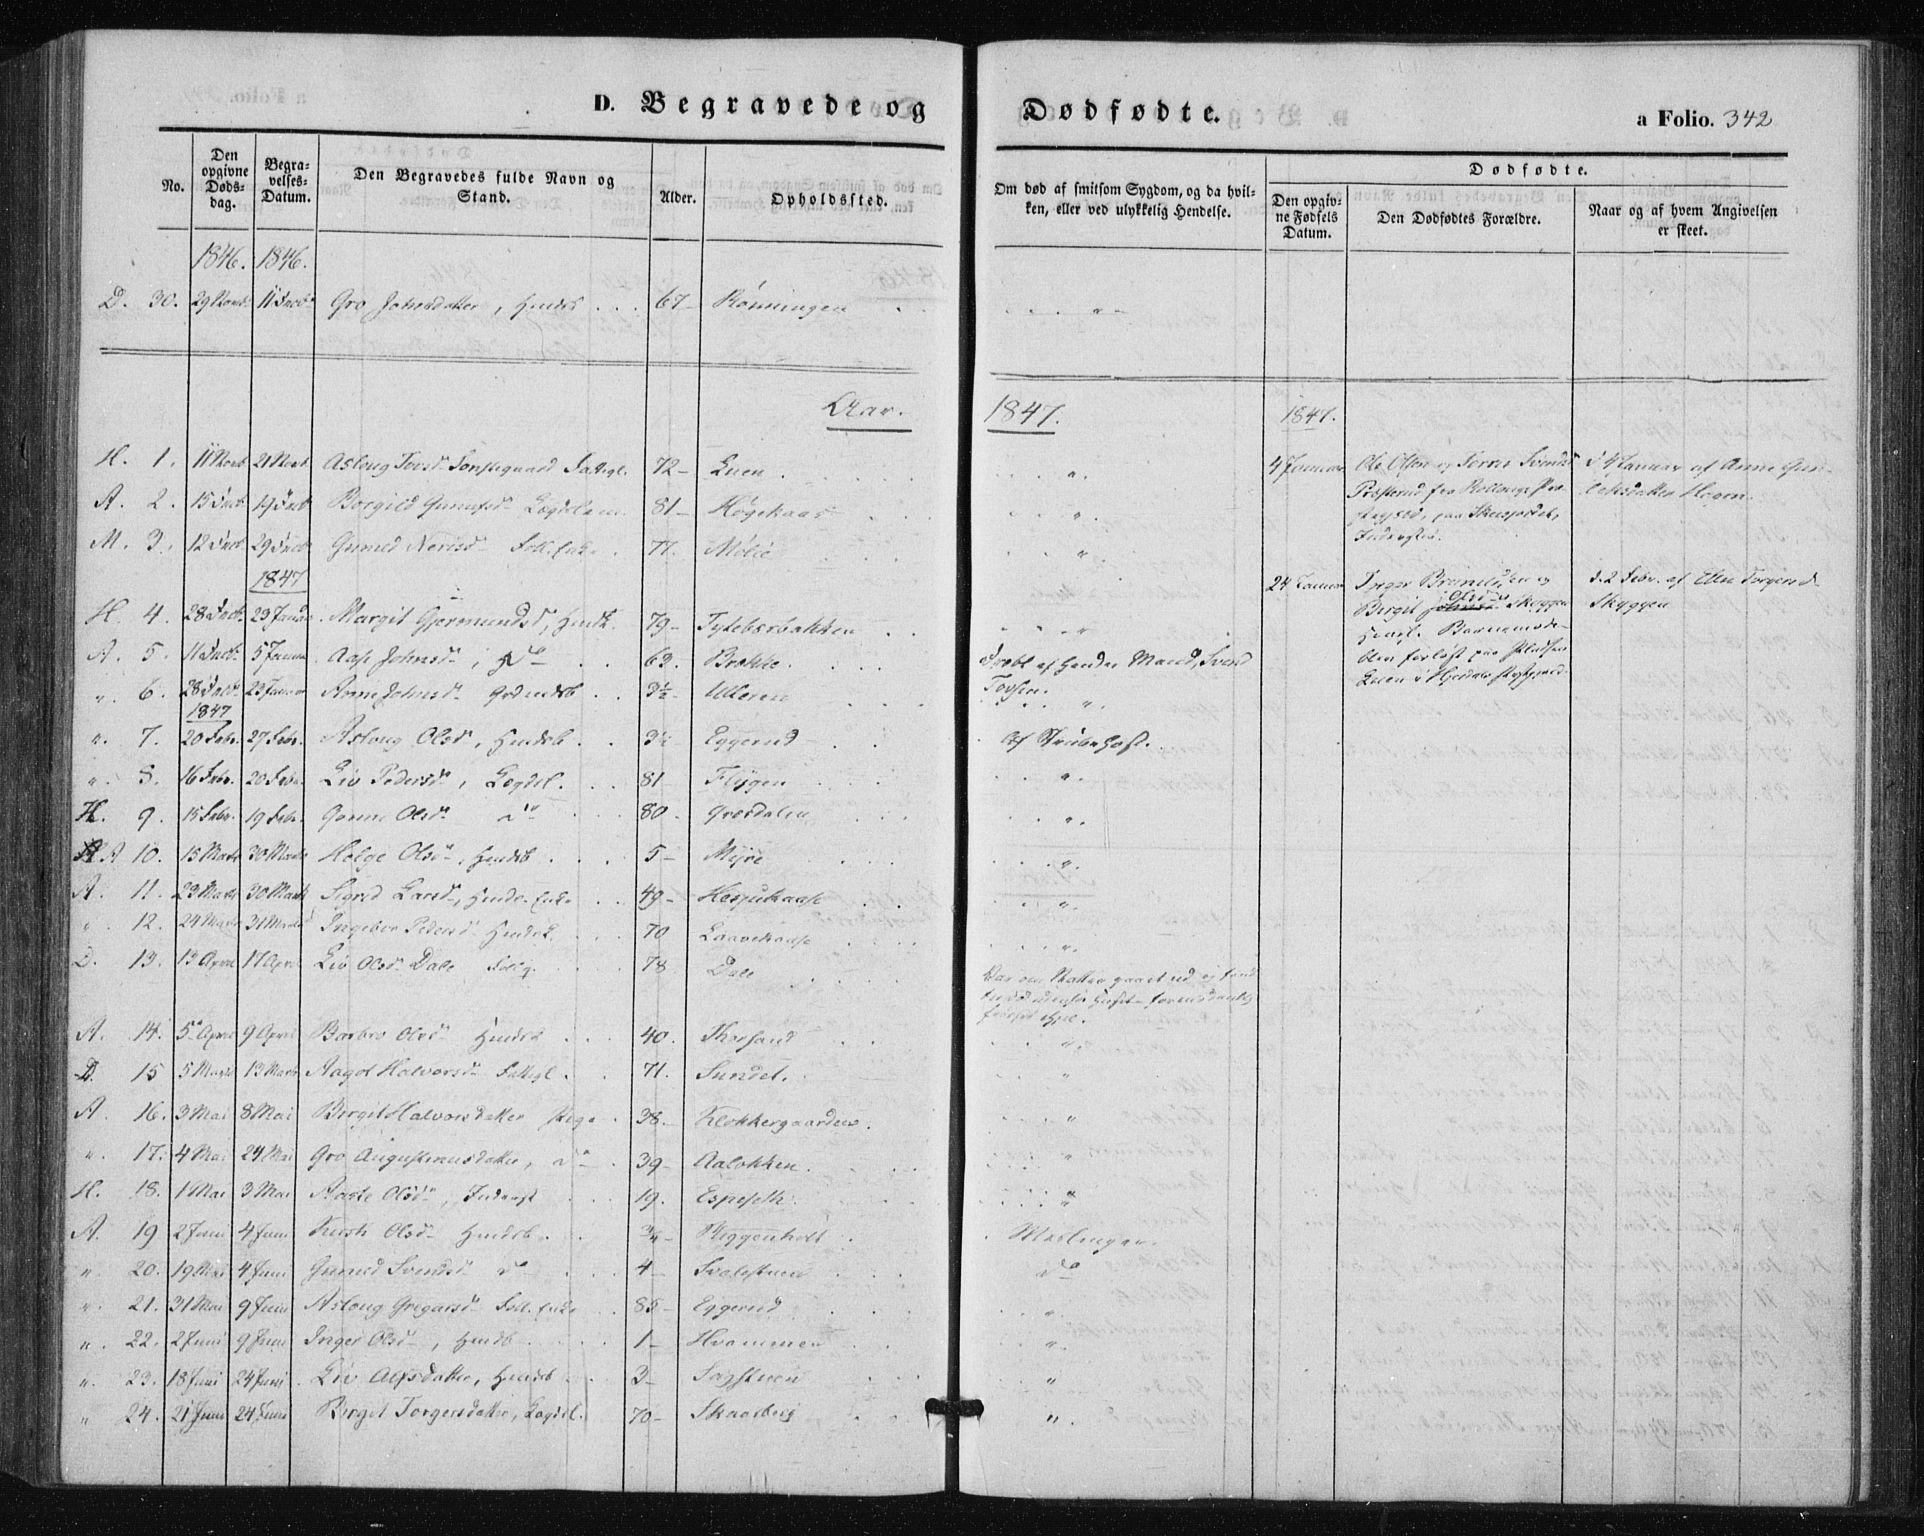 SAKO, Tinn kirkebøker, F/Fa/L0005: Ministerialbok nr. I 5, 1844-1856, s. 342